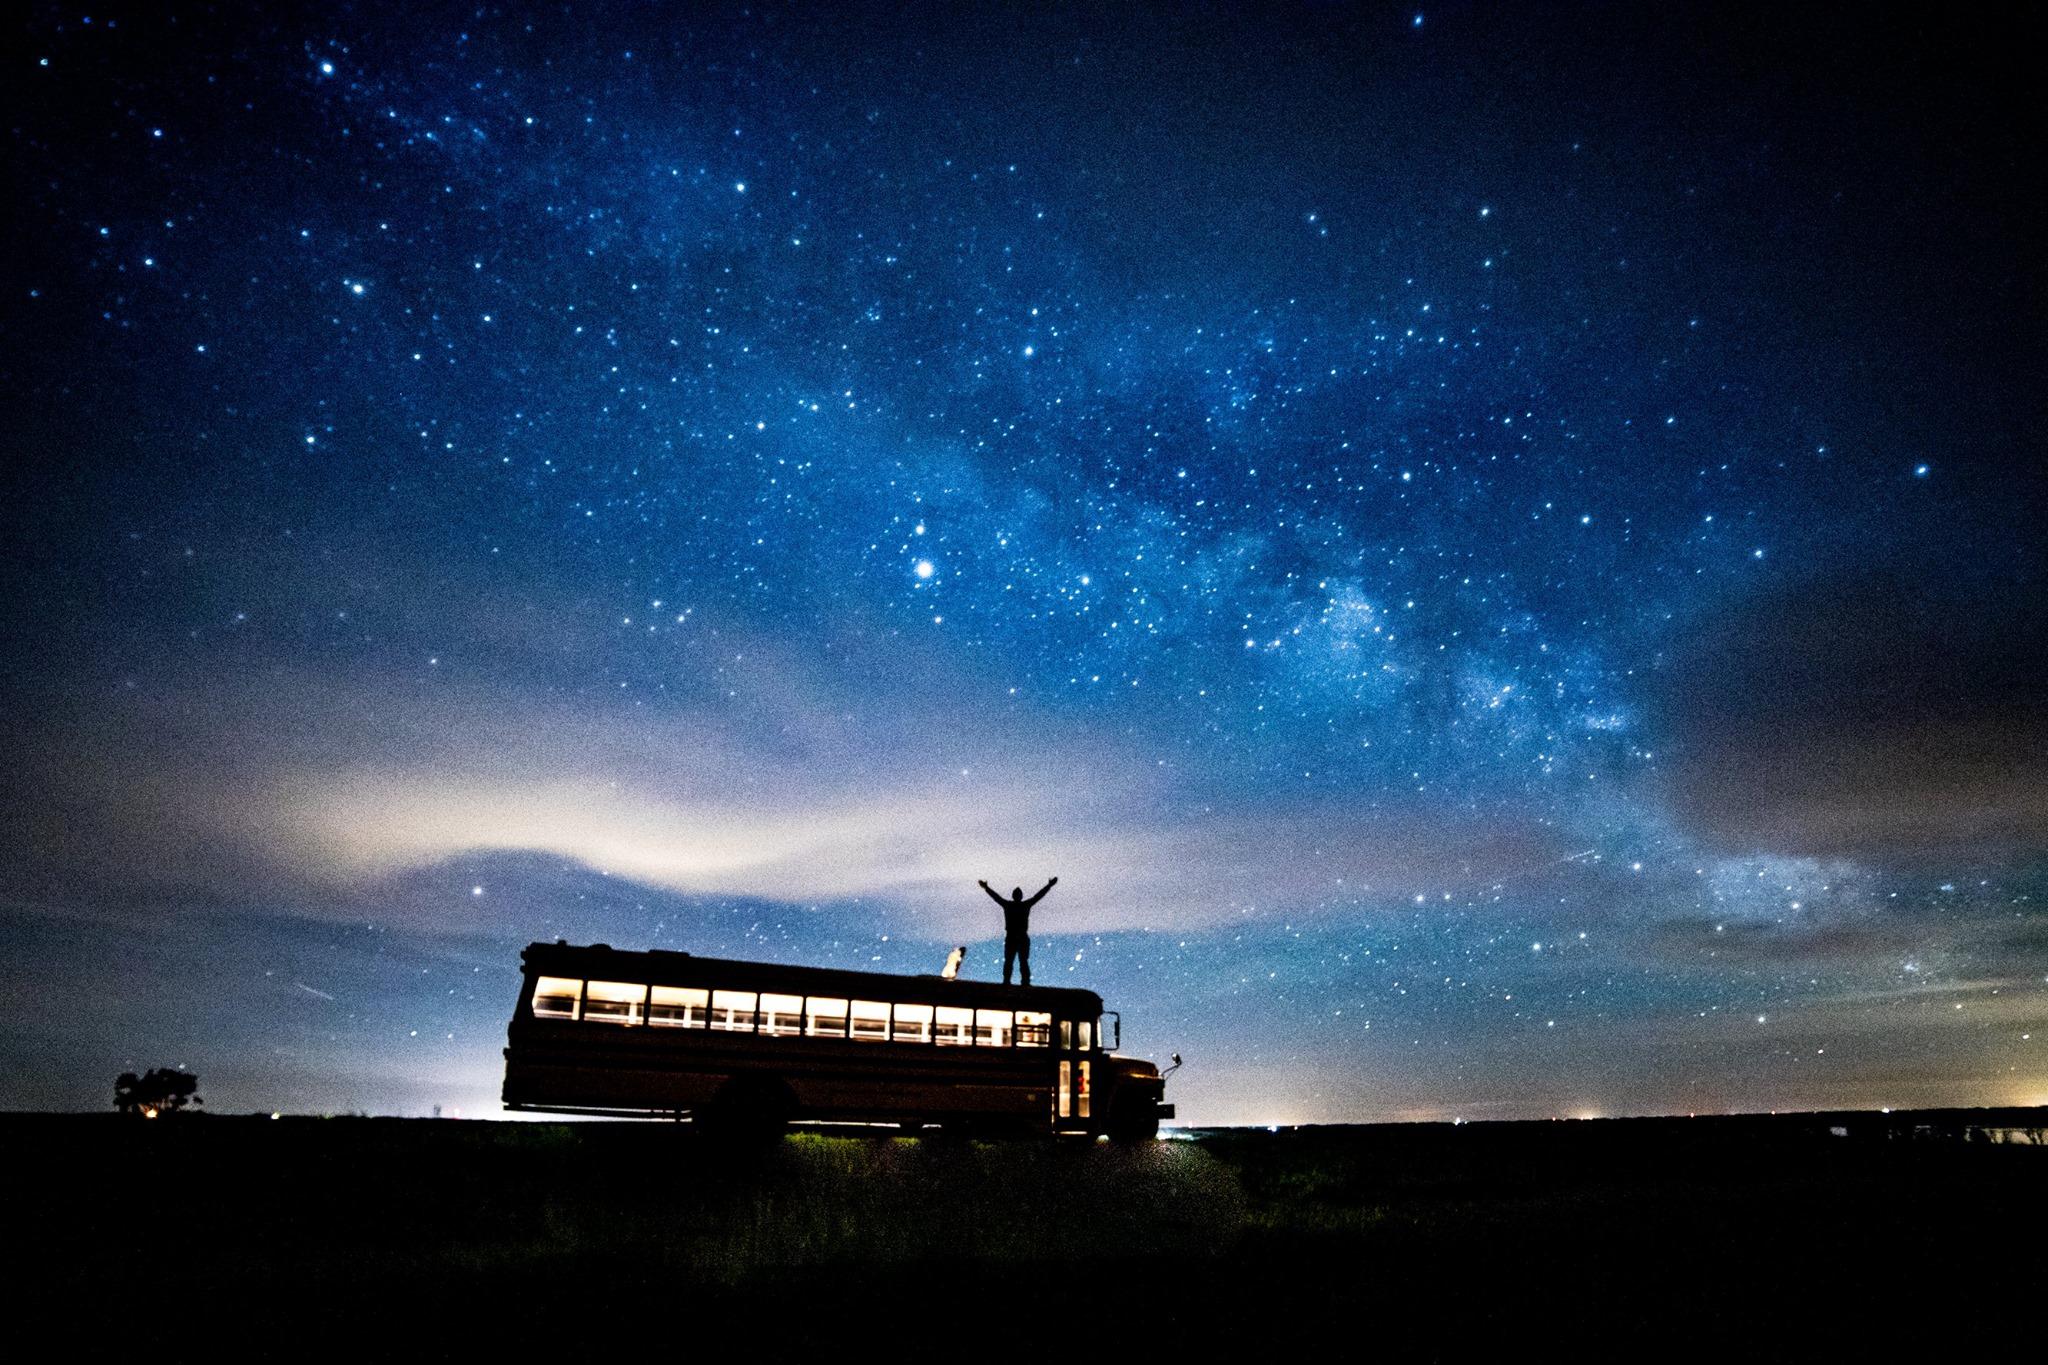 bus at night.jpg